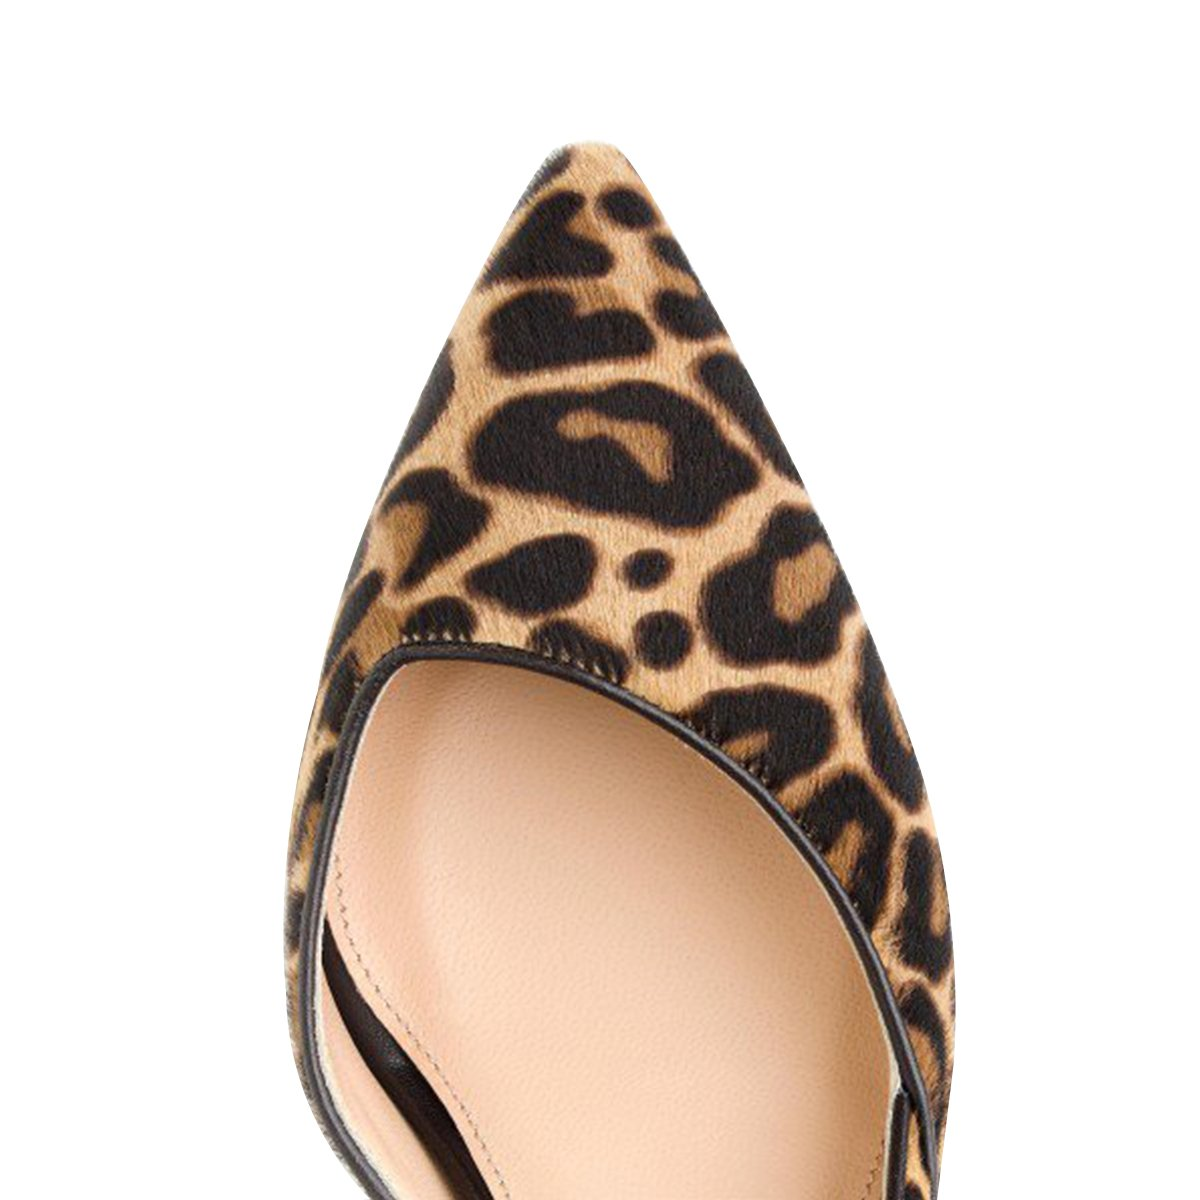 FSJ Women Sexy Leopard Printed Dress Shoes Pointy Toe High Heels Stilettos Pumps Size 4-15 US B076KCF714 9 B(M) US D'orsay-8 Cm